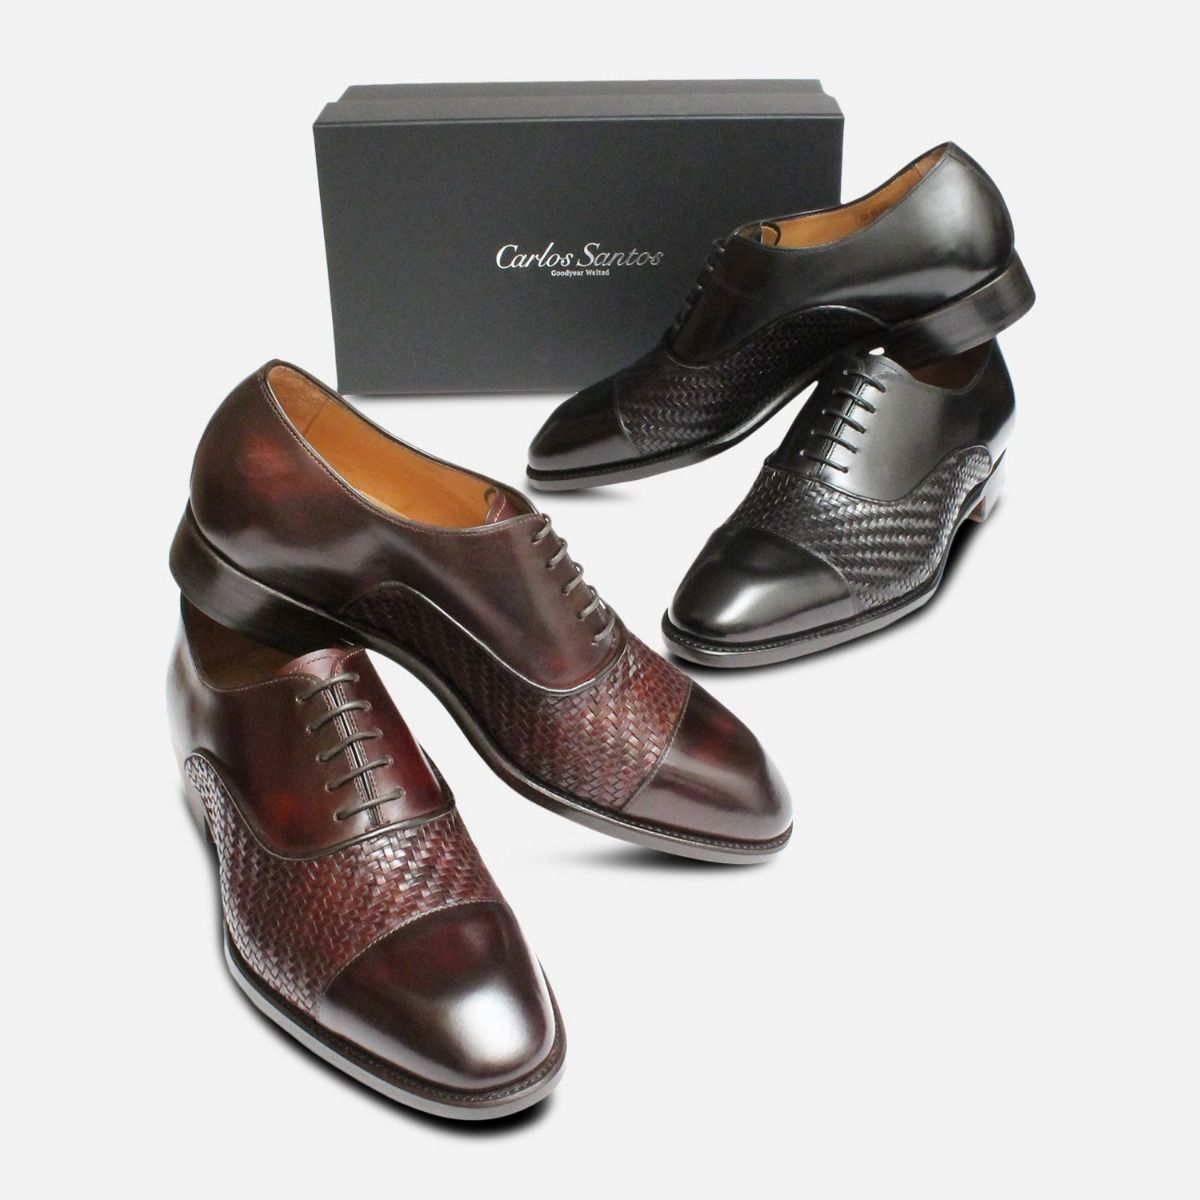 Black Weave Oxfords by Carlos Santos Shoes